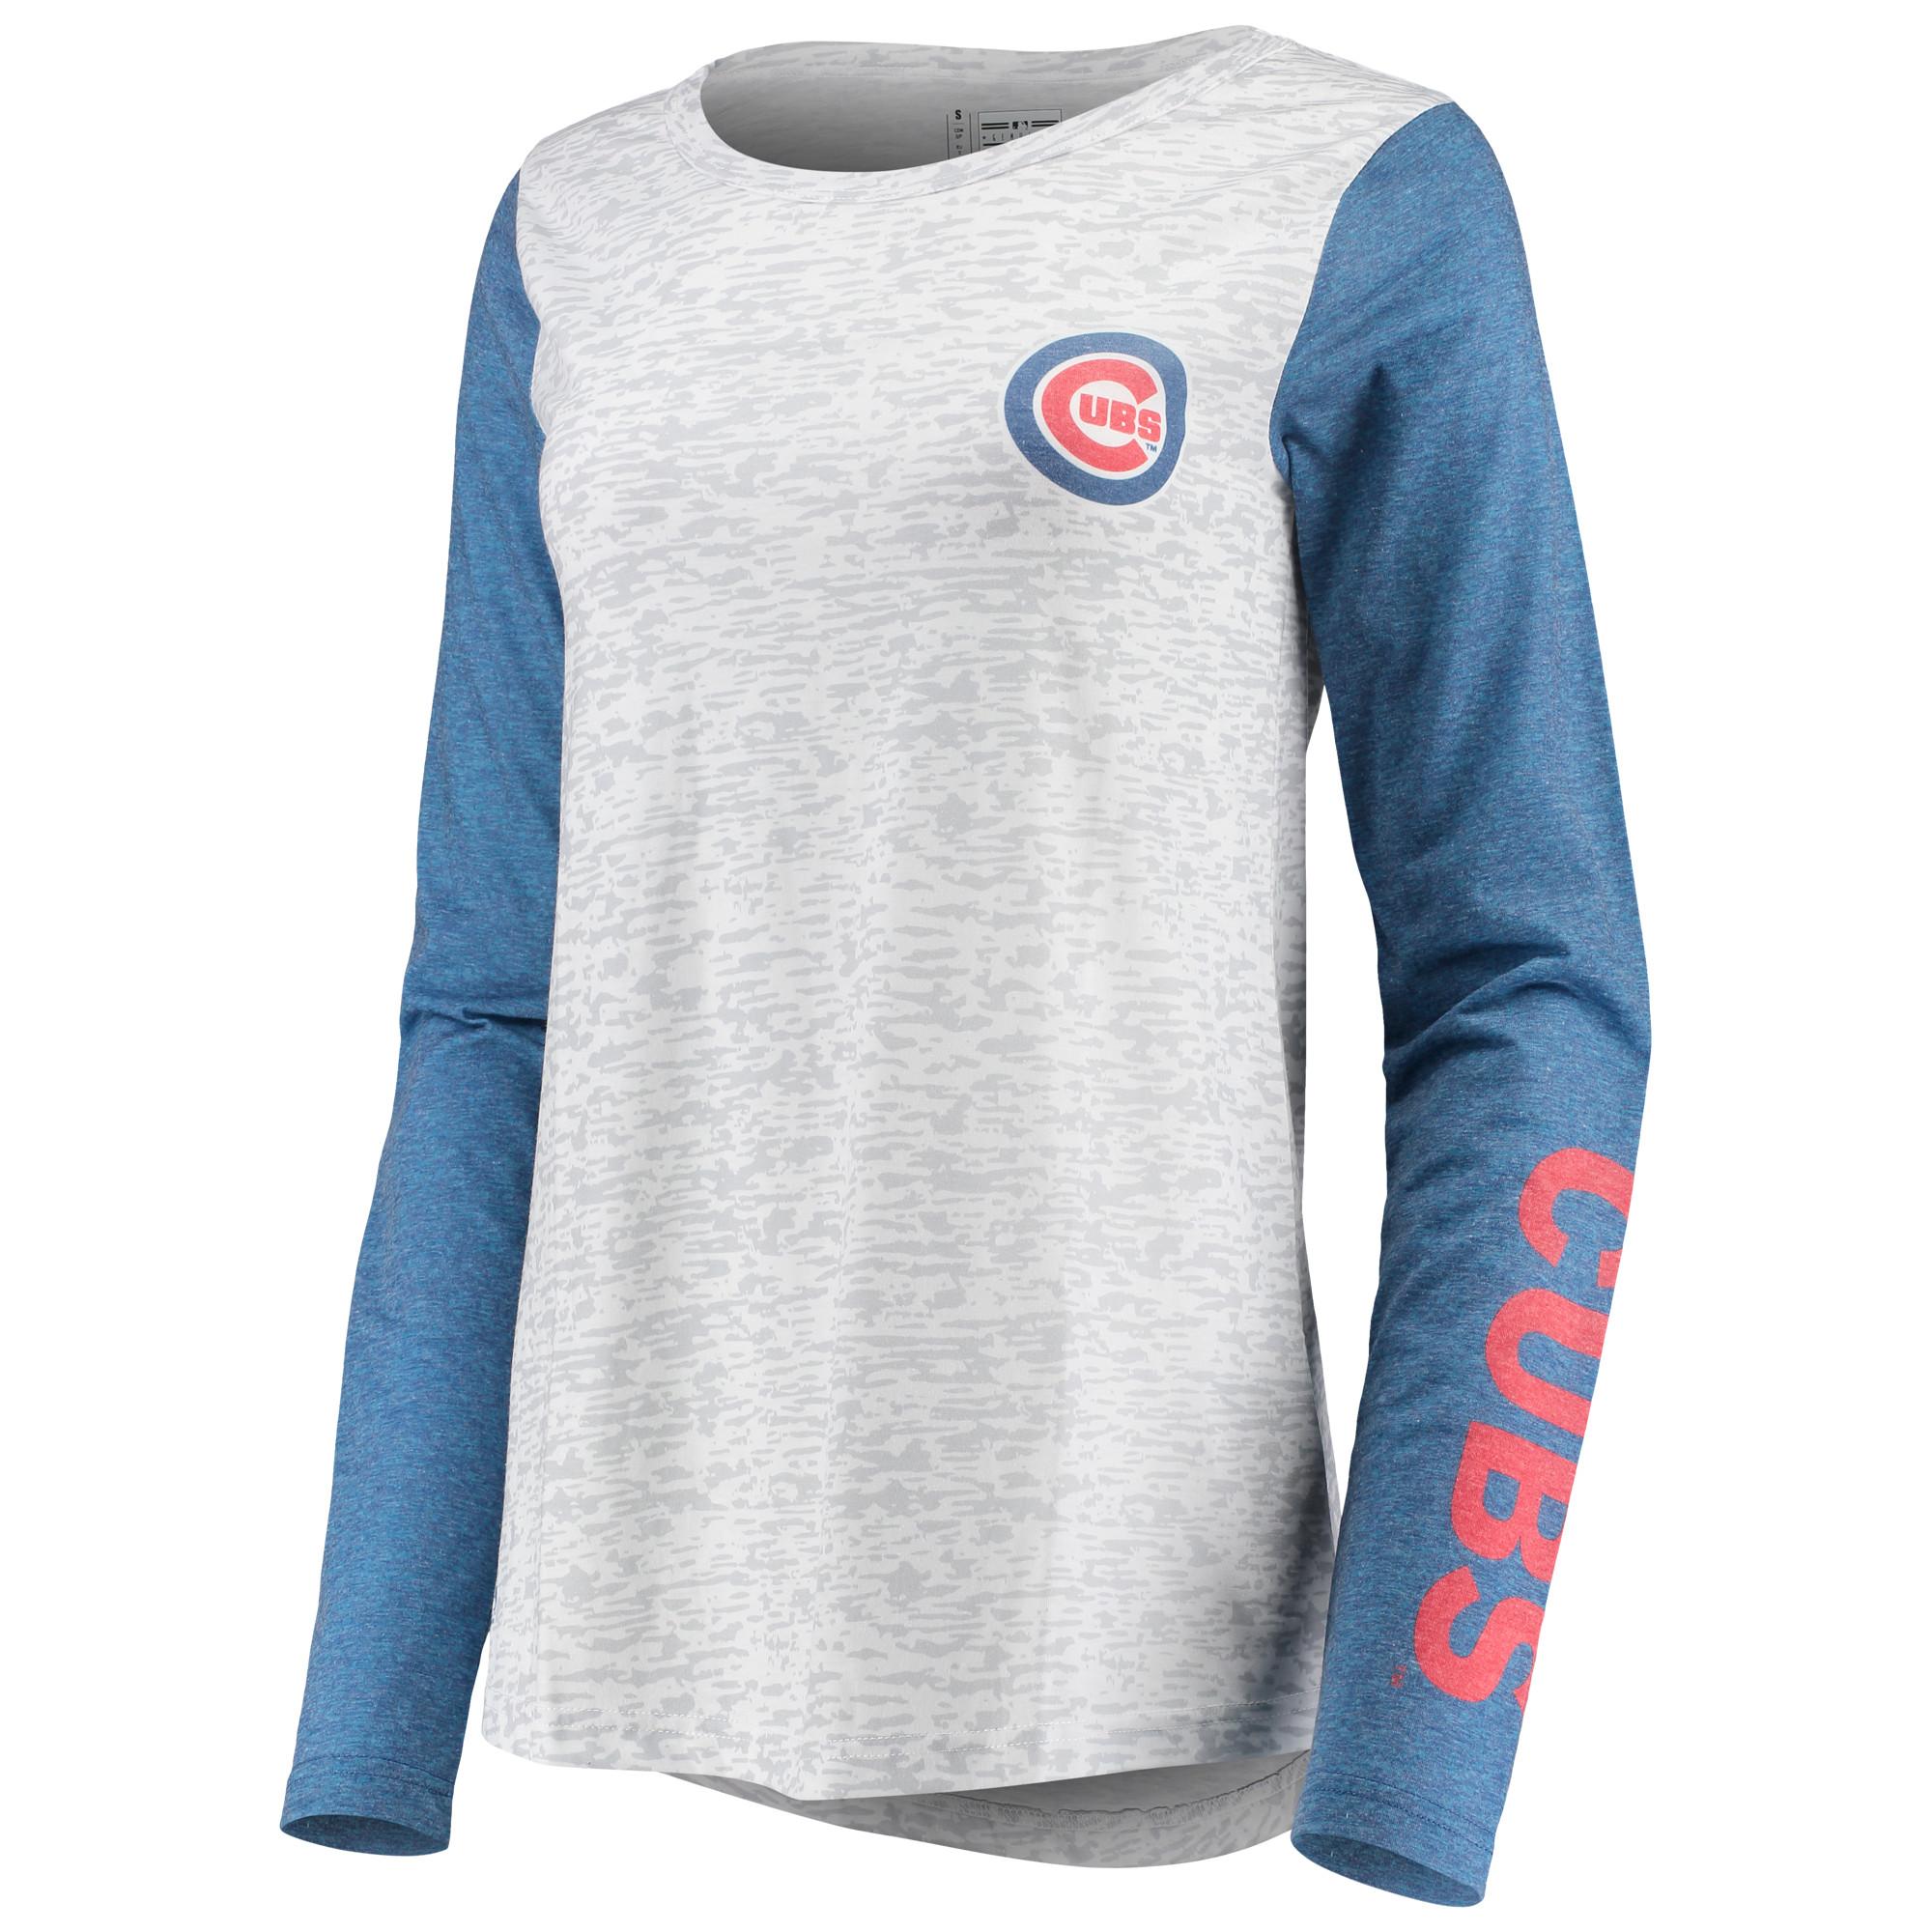 Chicago Cubs Women's Heathered Boyfriend Long Sleeve T-Shirt - White/Royal